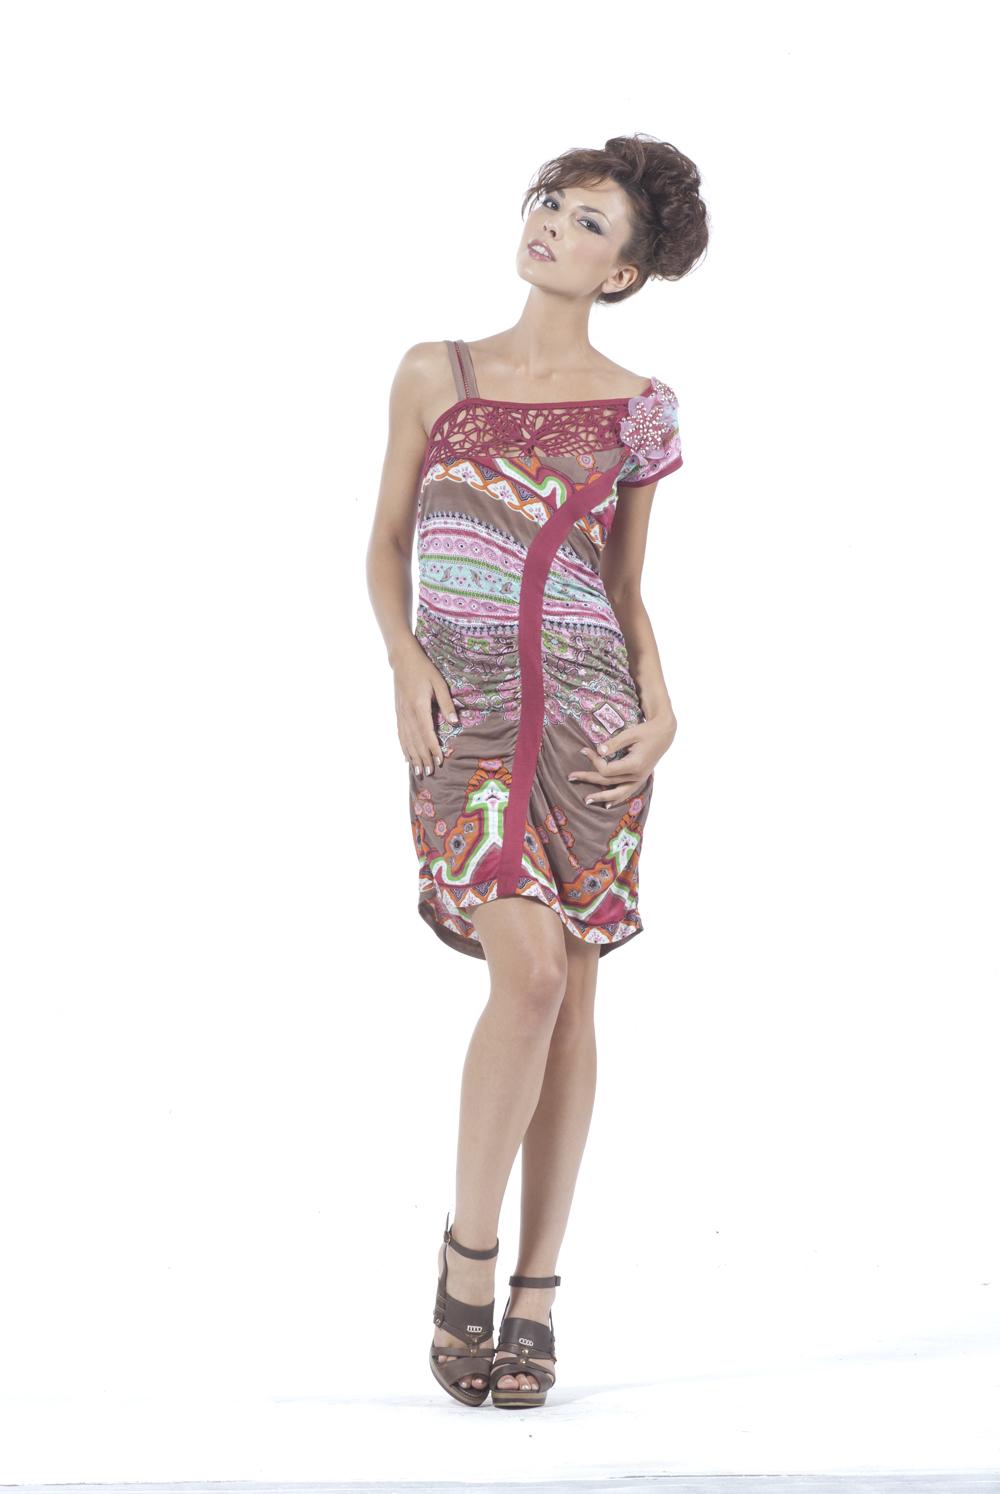 Les Fees Du Vent Arabesque Asymmetrical Dress (2 Left!) LFDV_884201_DRESS